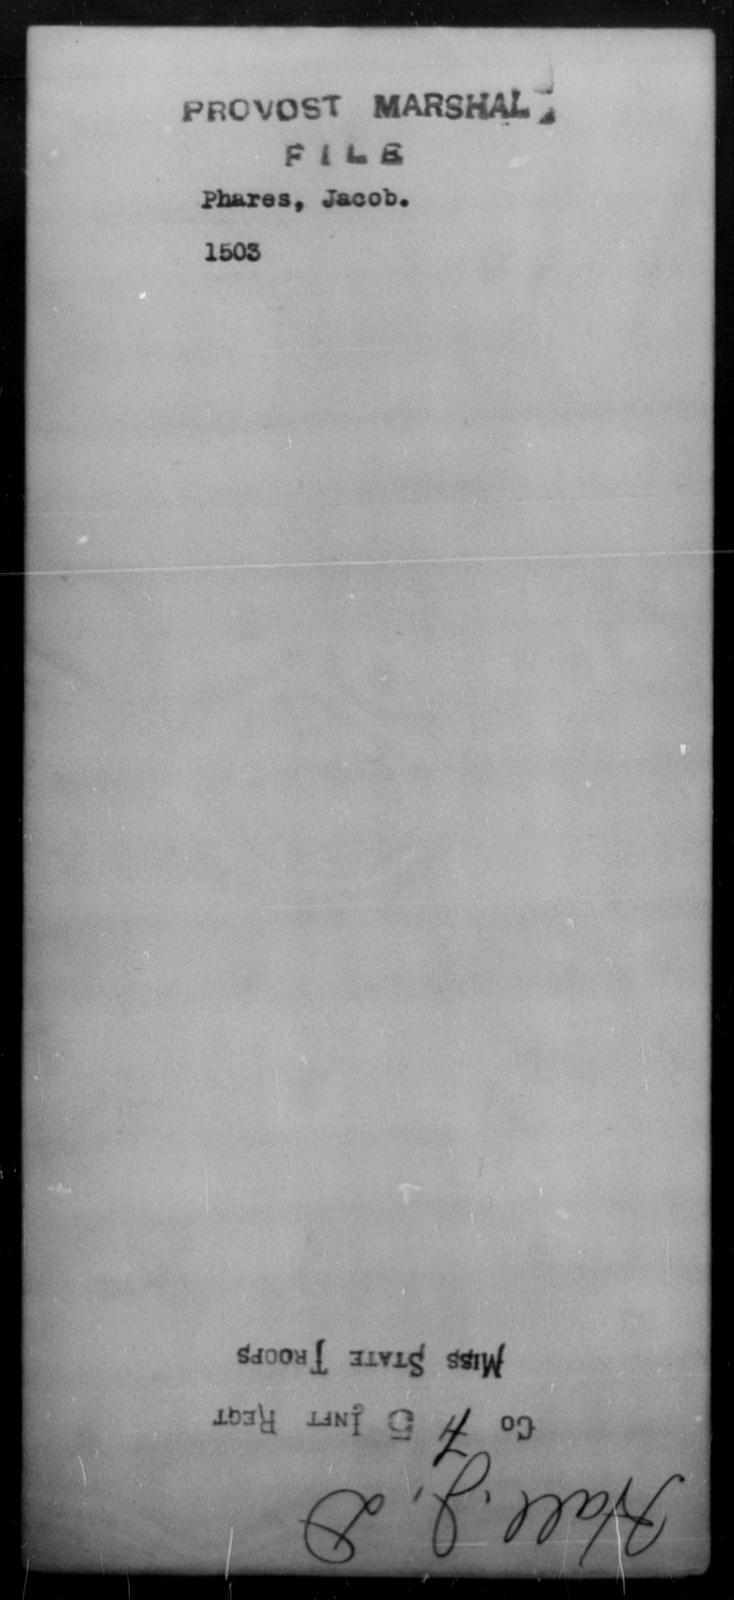 Phares, Jacob - State: [Blank] - Year: [Blank]